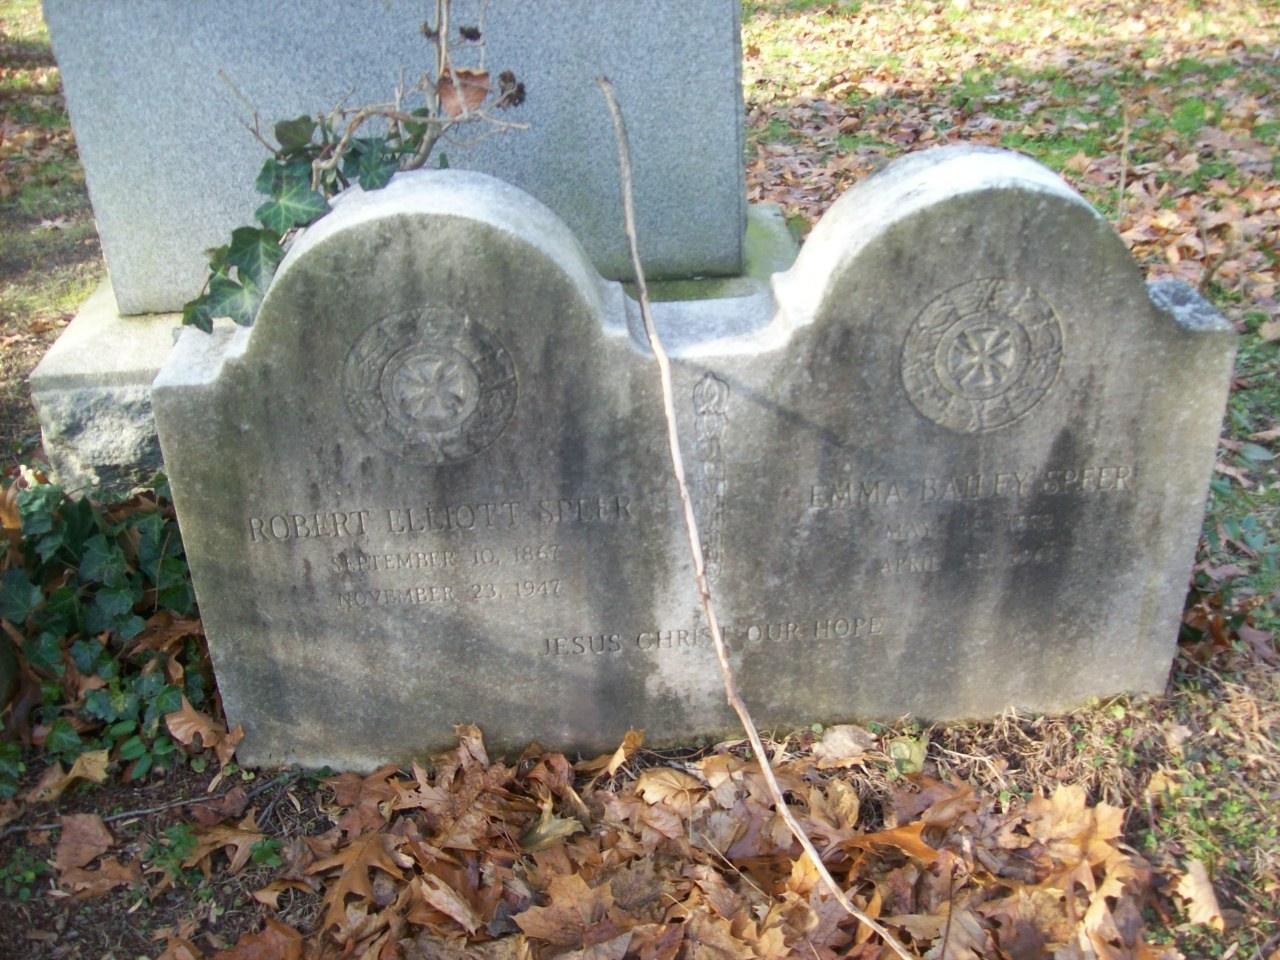 Robert Elliott Speer is buried at Brookside Cemetery, Englewood, New Jersey.